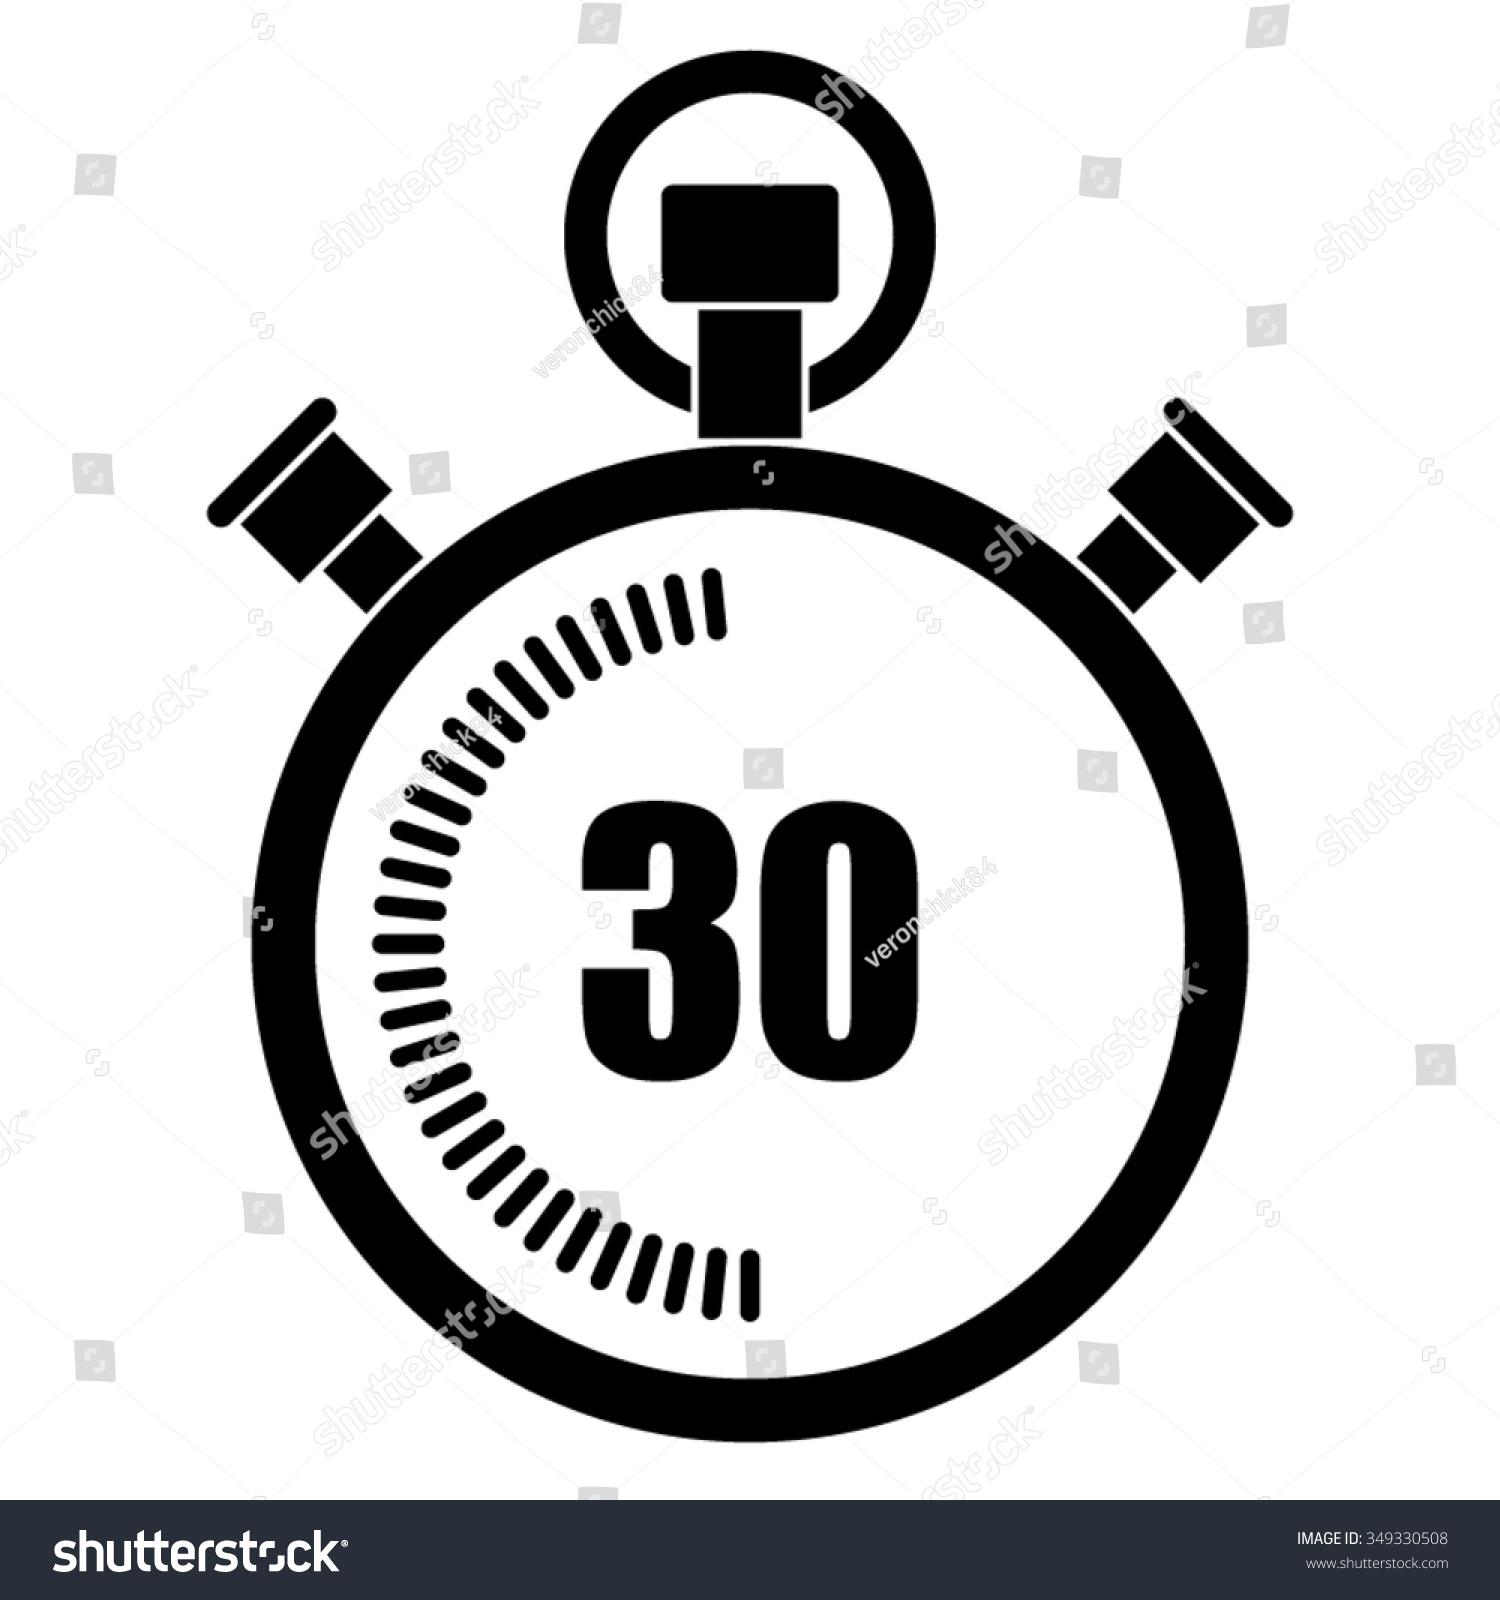 Stopwatch Vector Icon 30 Seconds Stock Vector 349330508 - Shutterstock